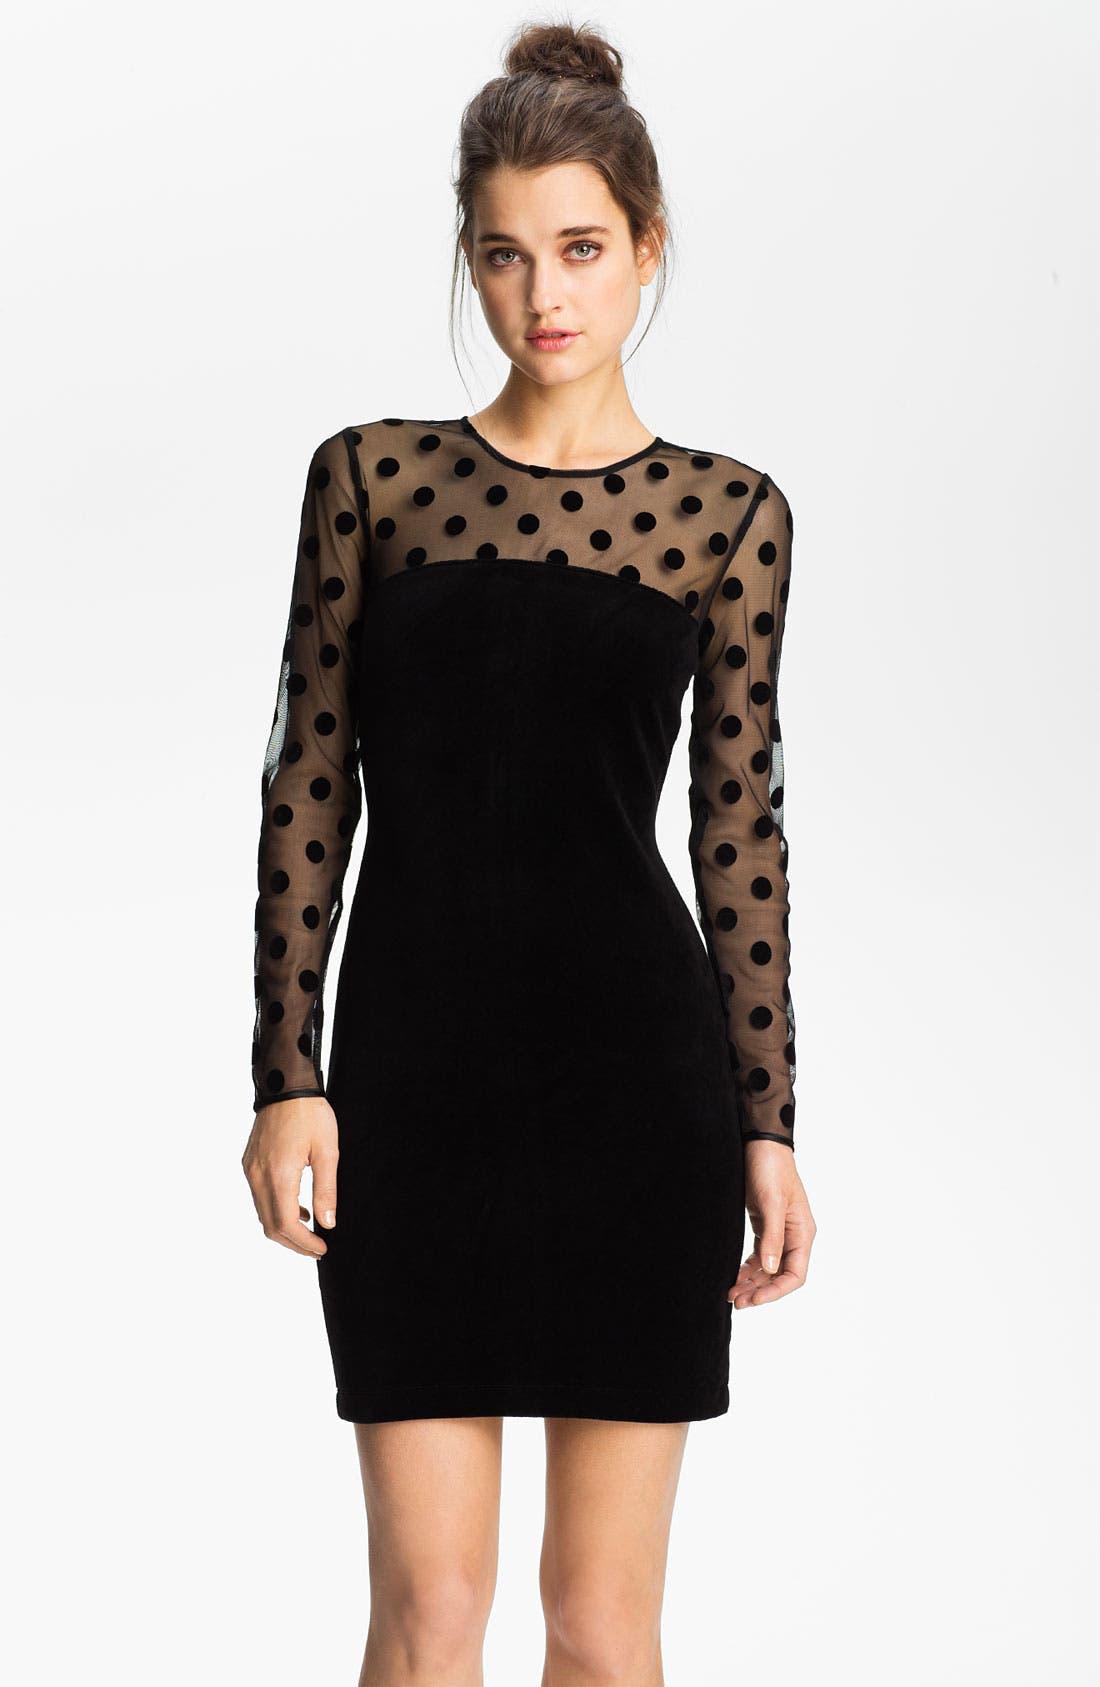 Alternate Image 1 Selected - Juicy Couture Sheer Polka Dot & Velvet Dress